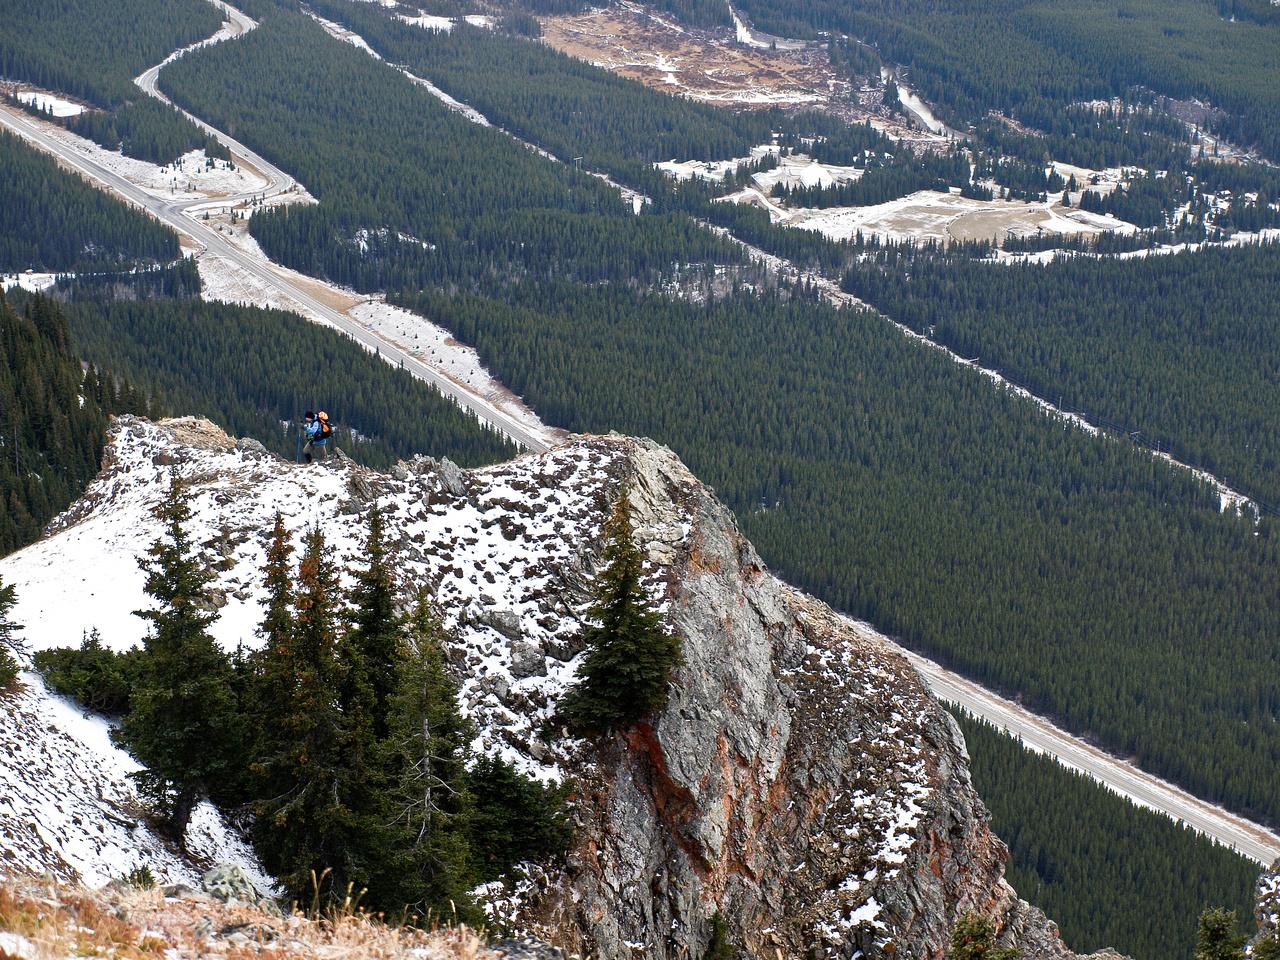 Wietse descends the ridge.